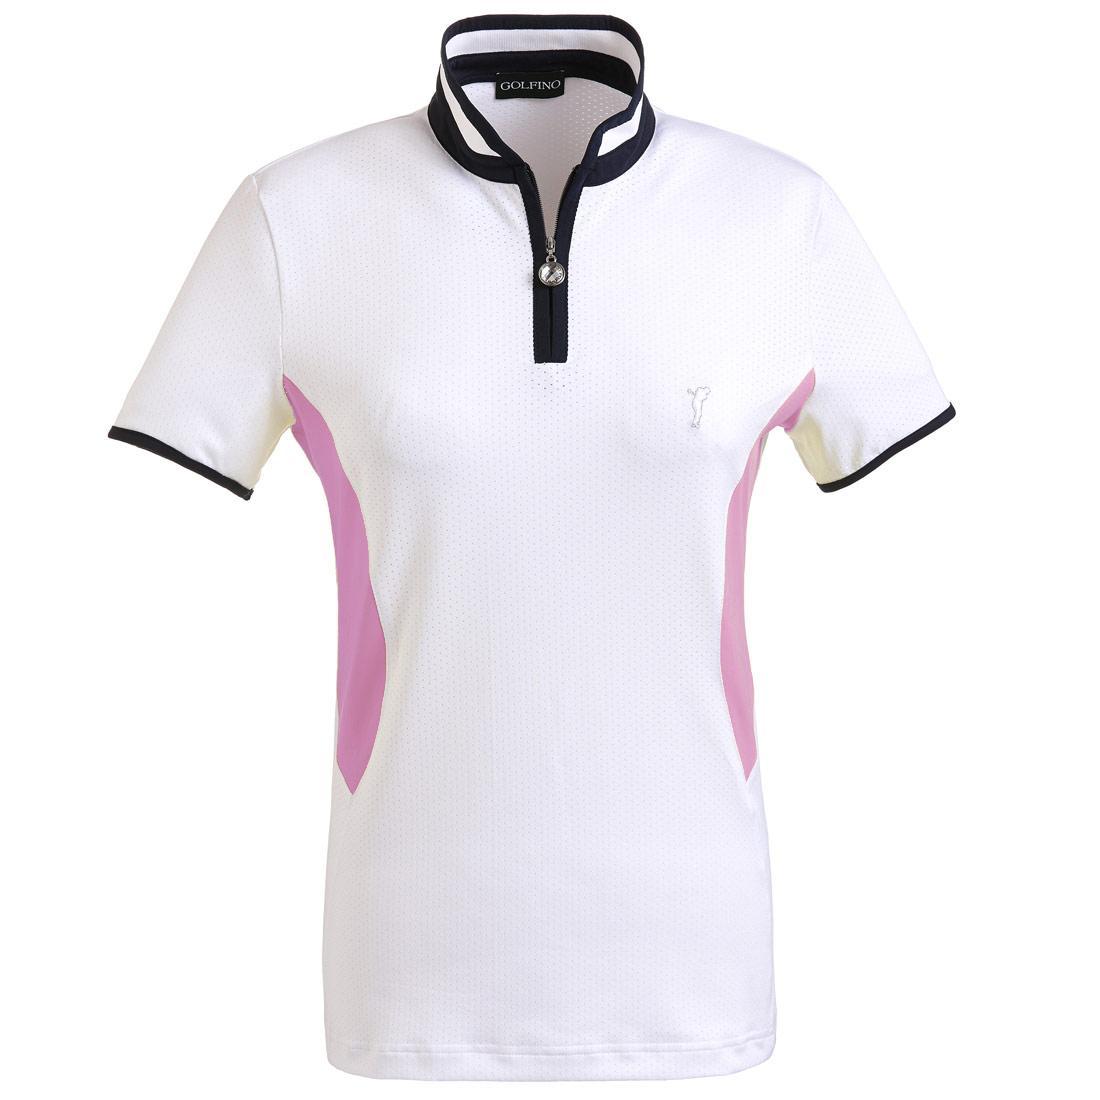 Damen Kurzarm Funktions-Golfpolohemd aus elastischem Mesh